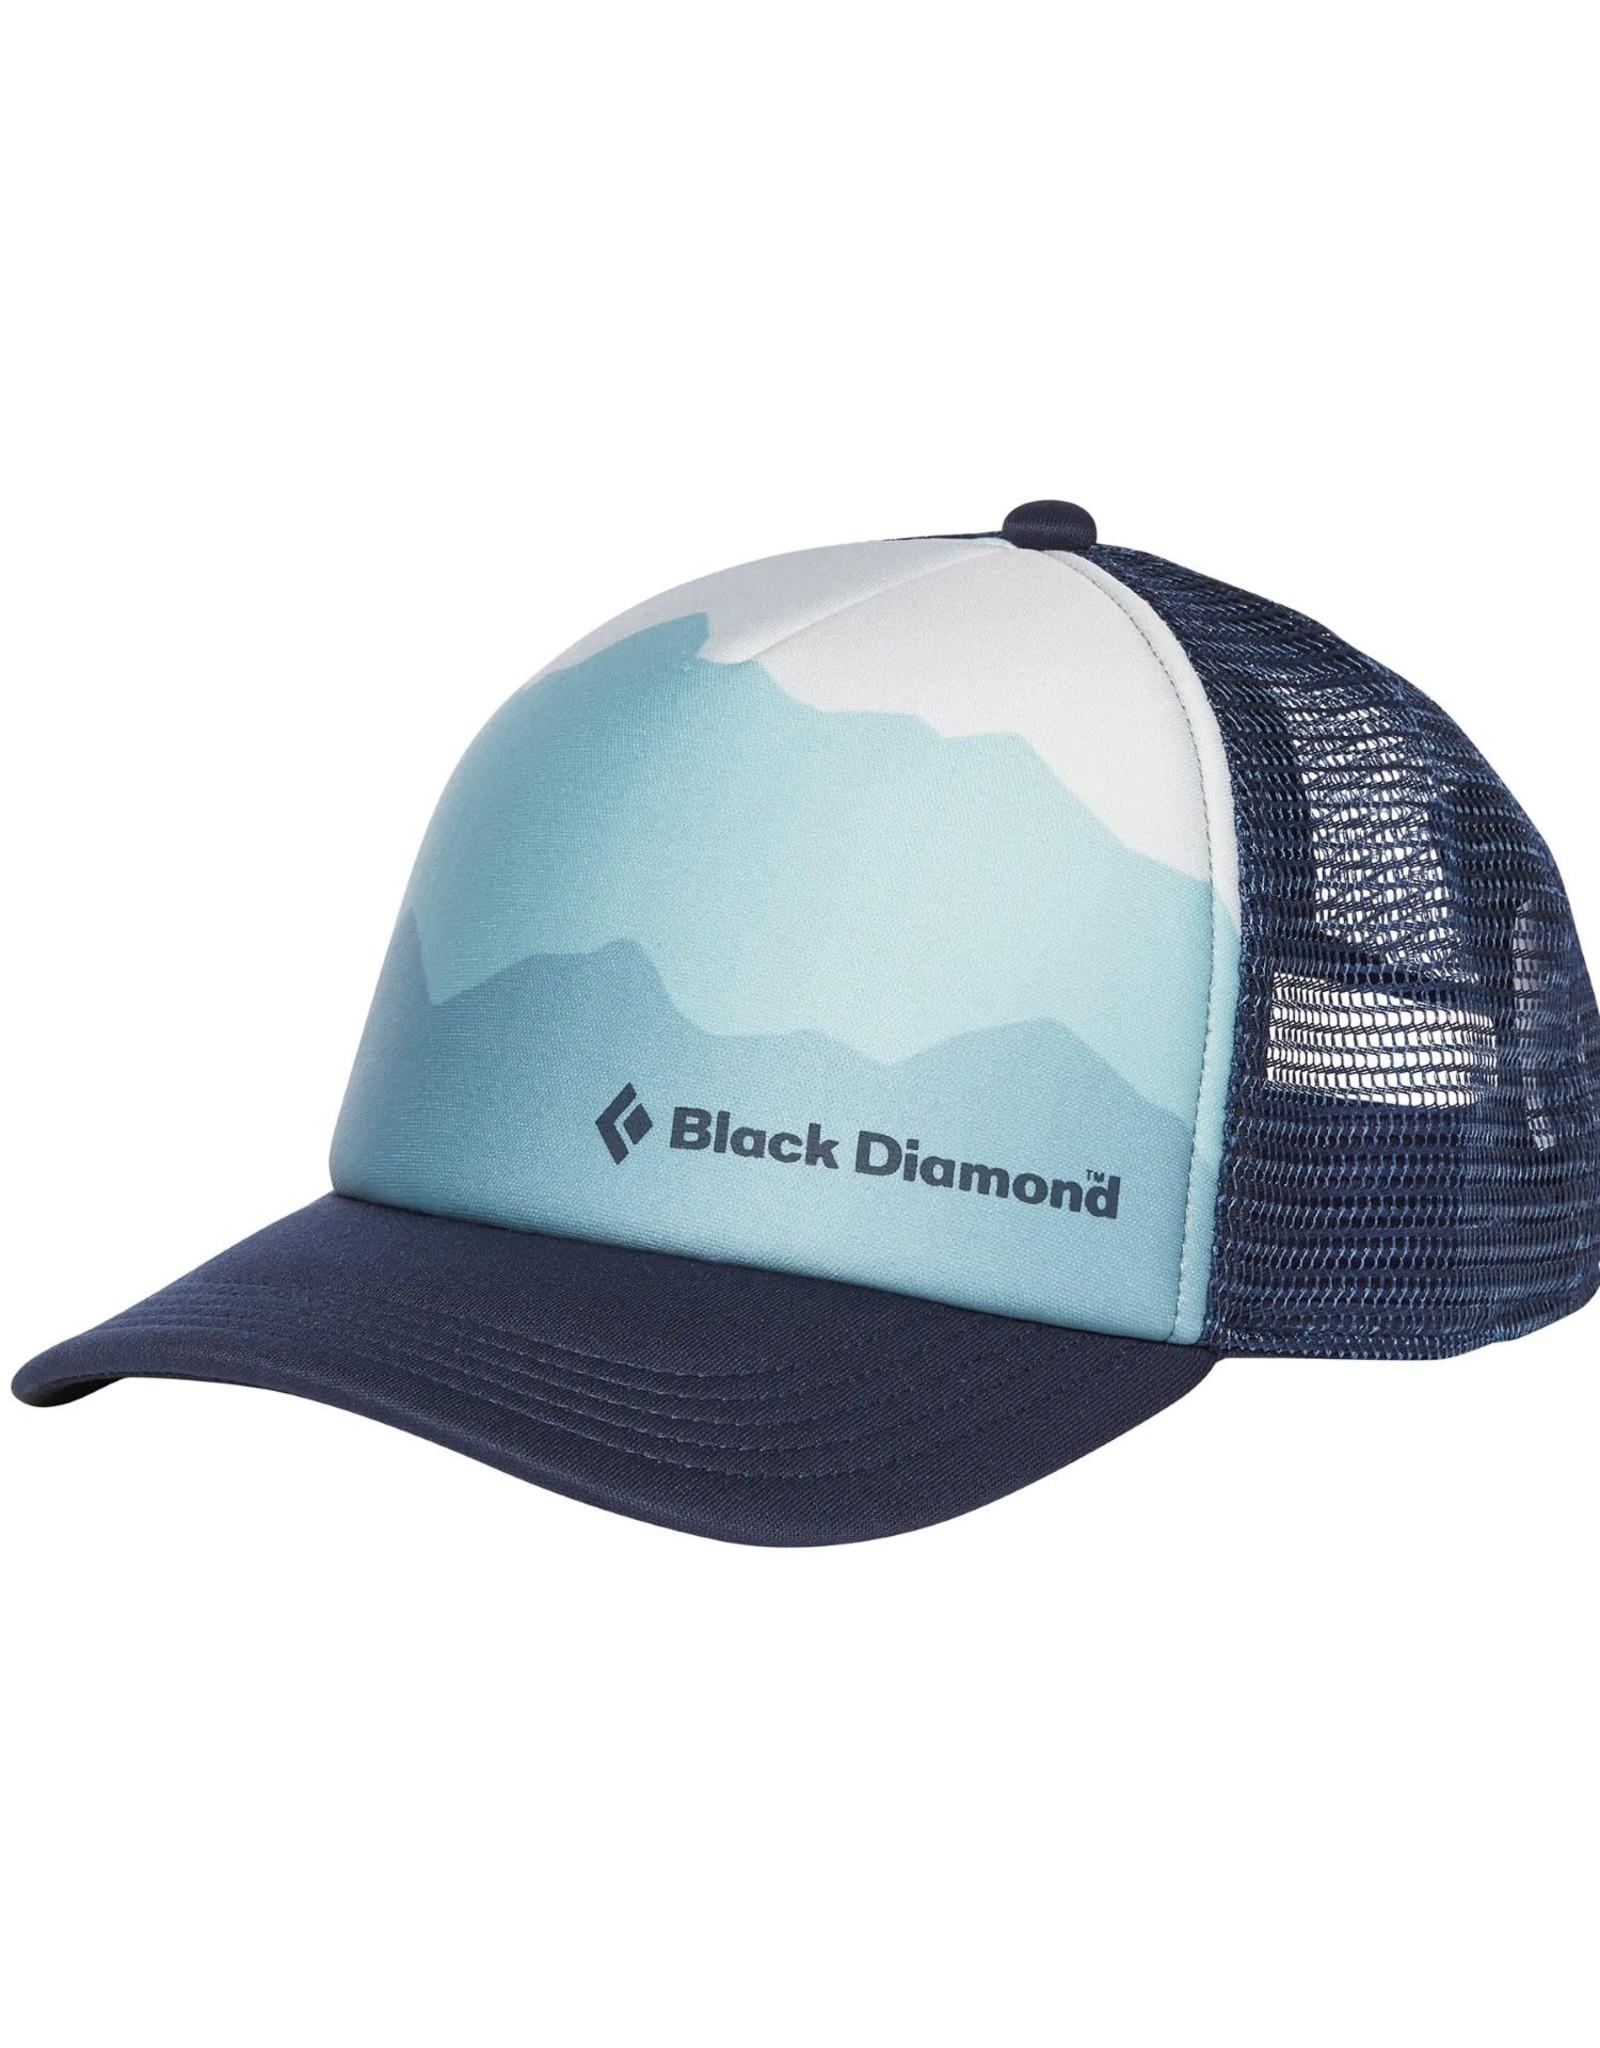 Black Diamond Black Diamond Trucker Hat - Women